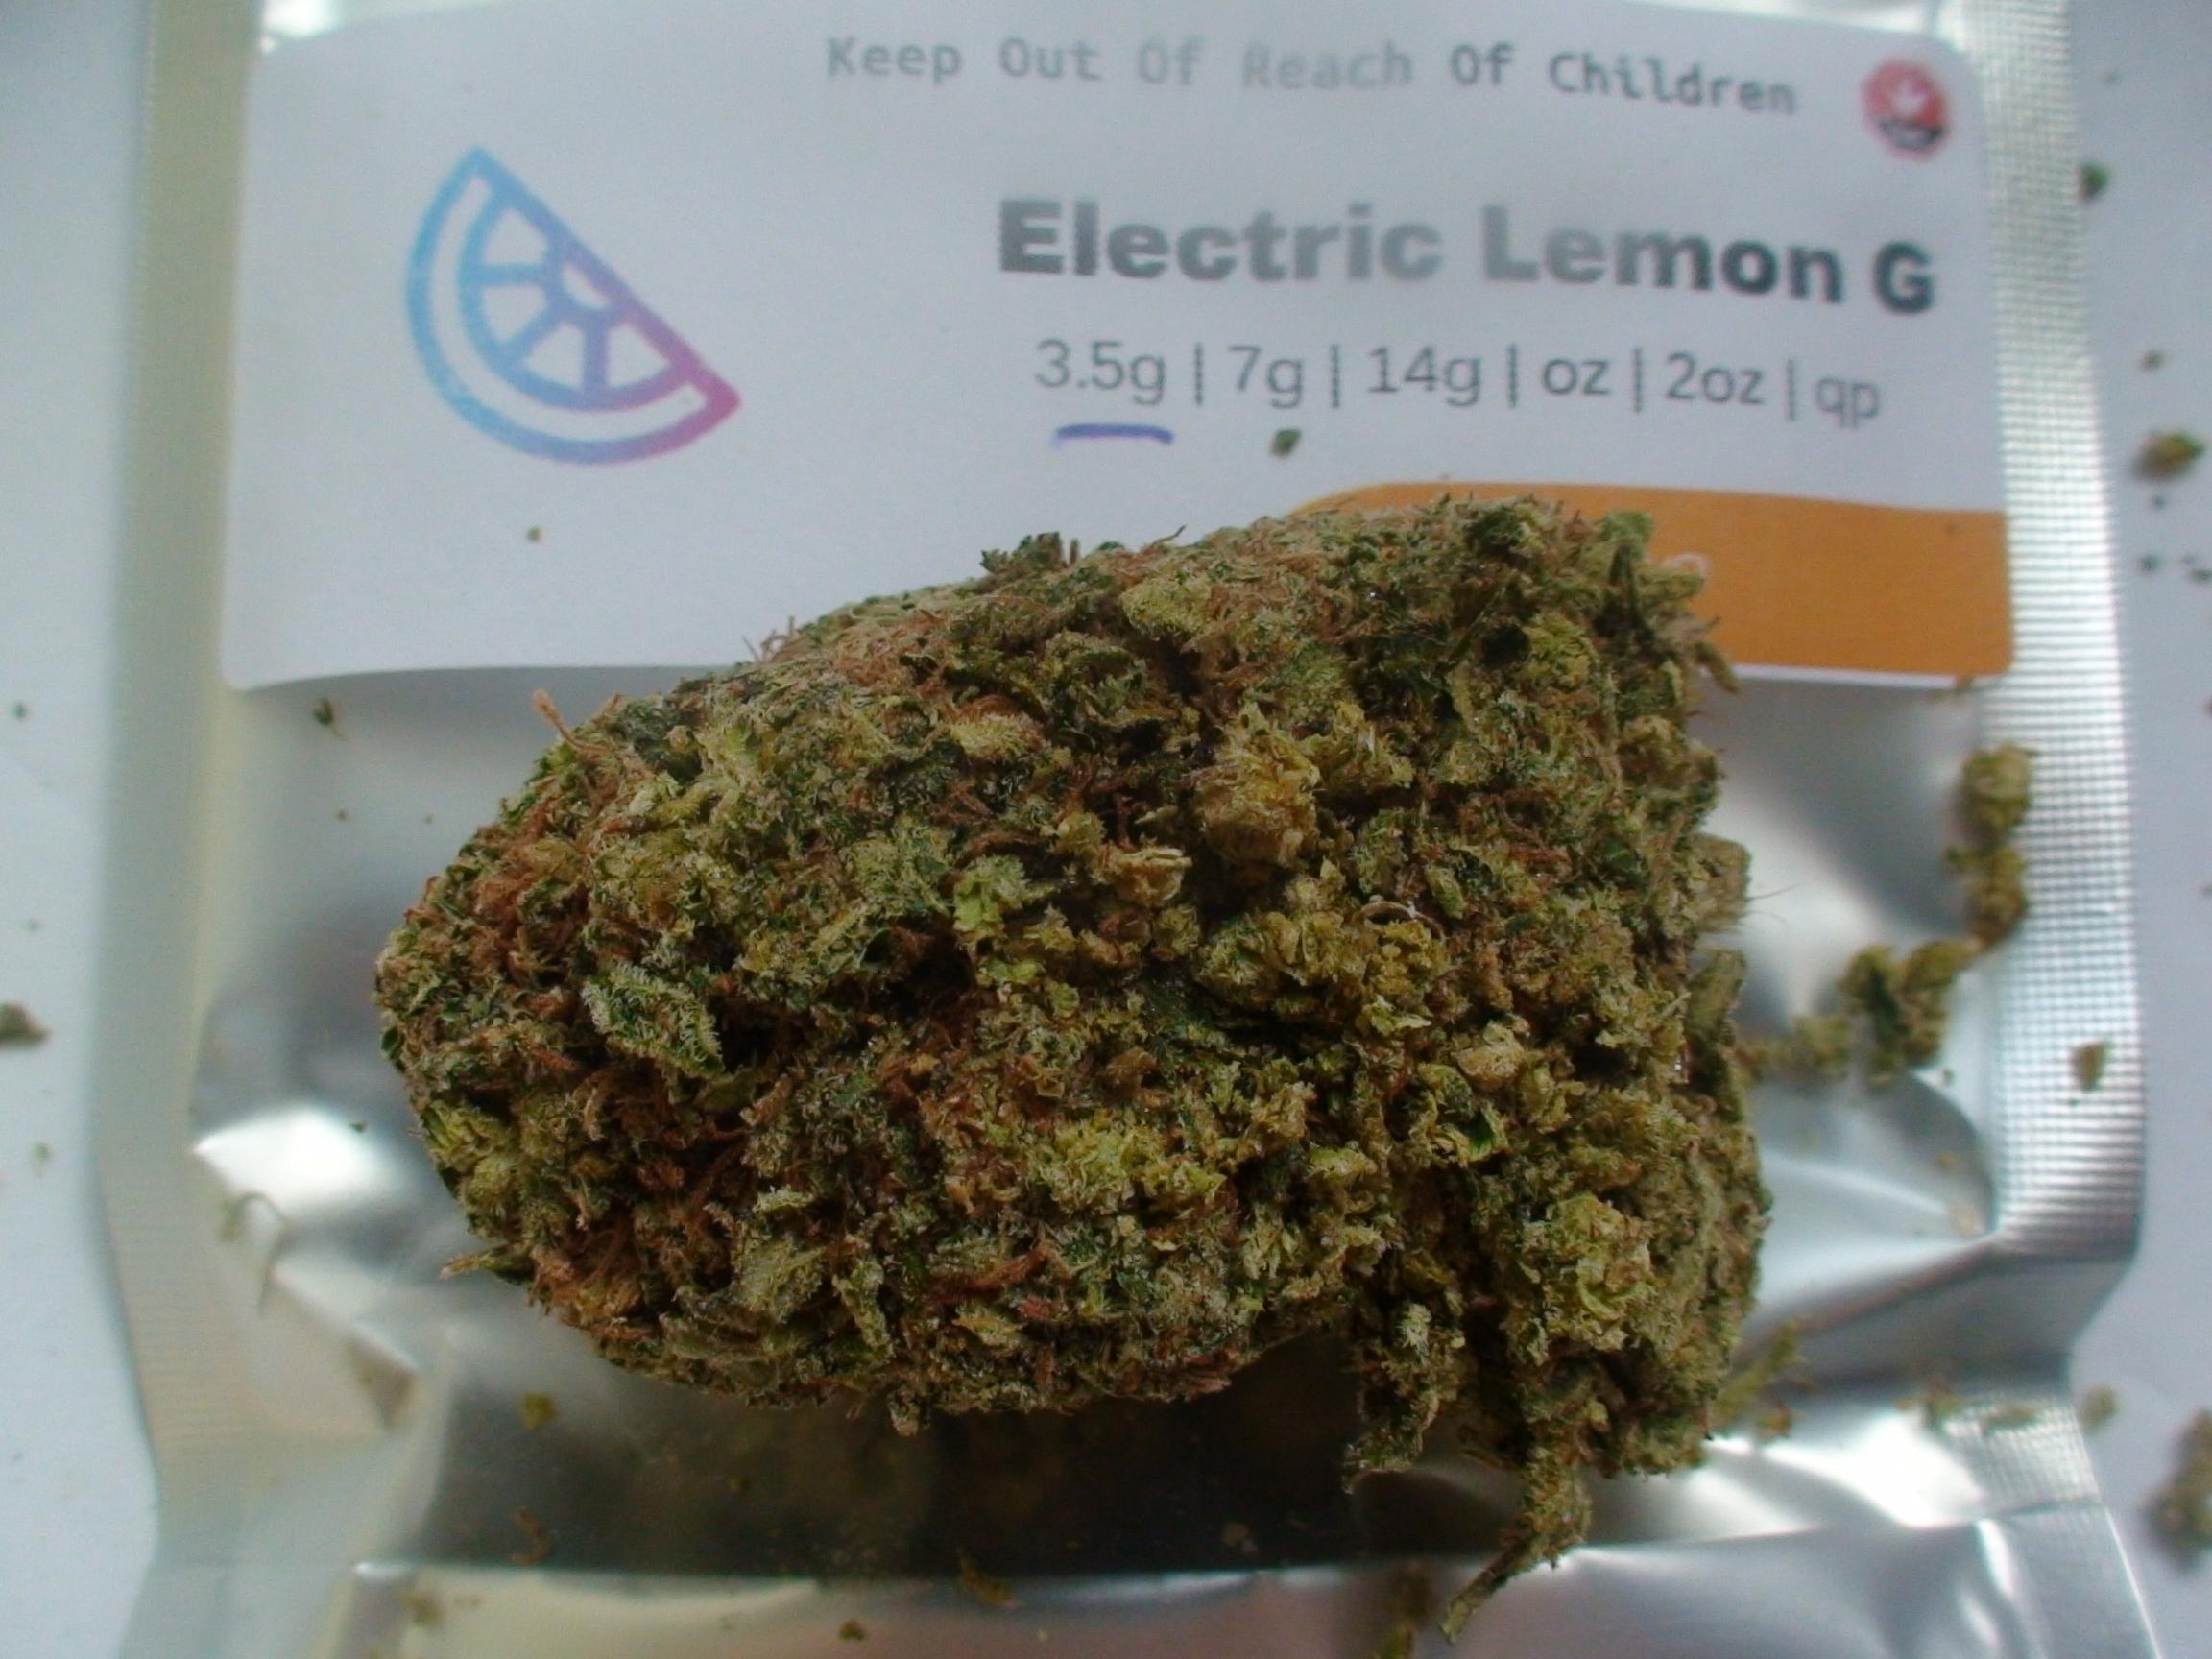 electric lemon cannabis